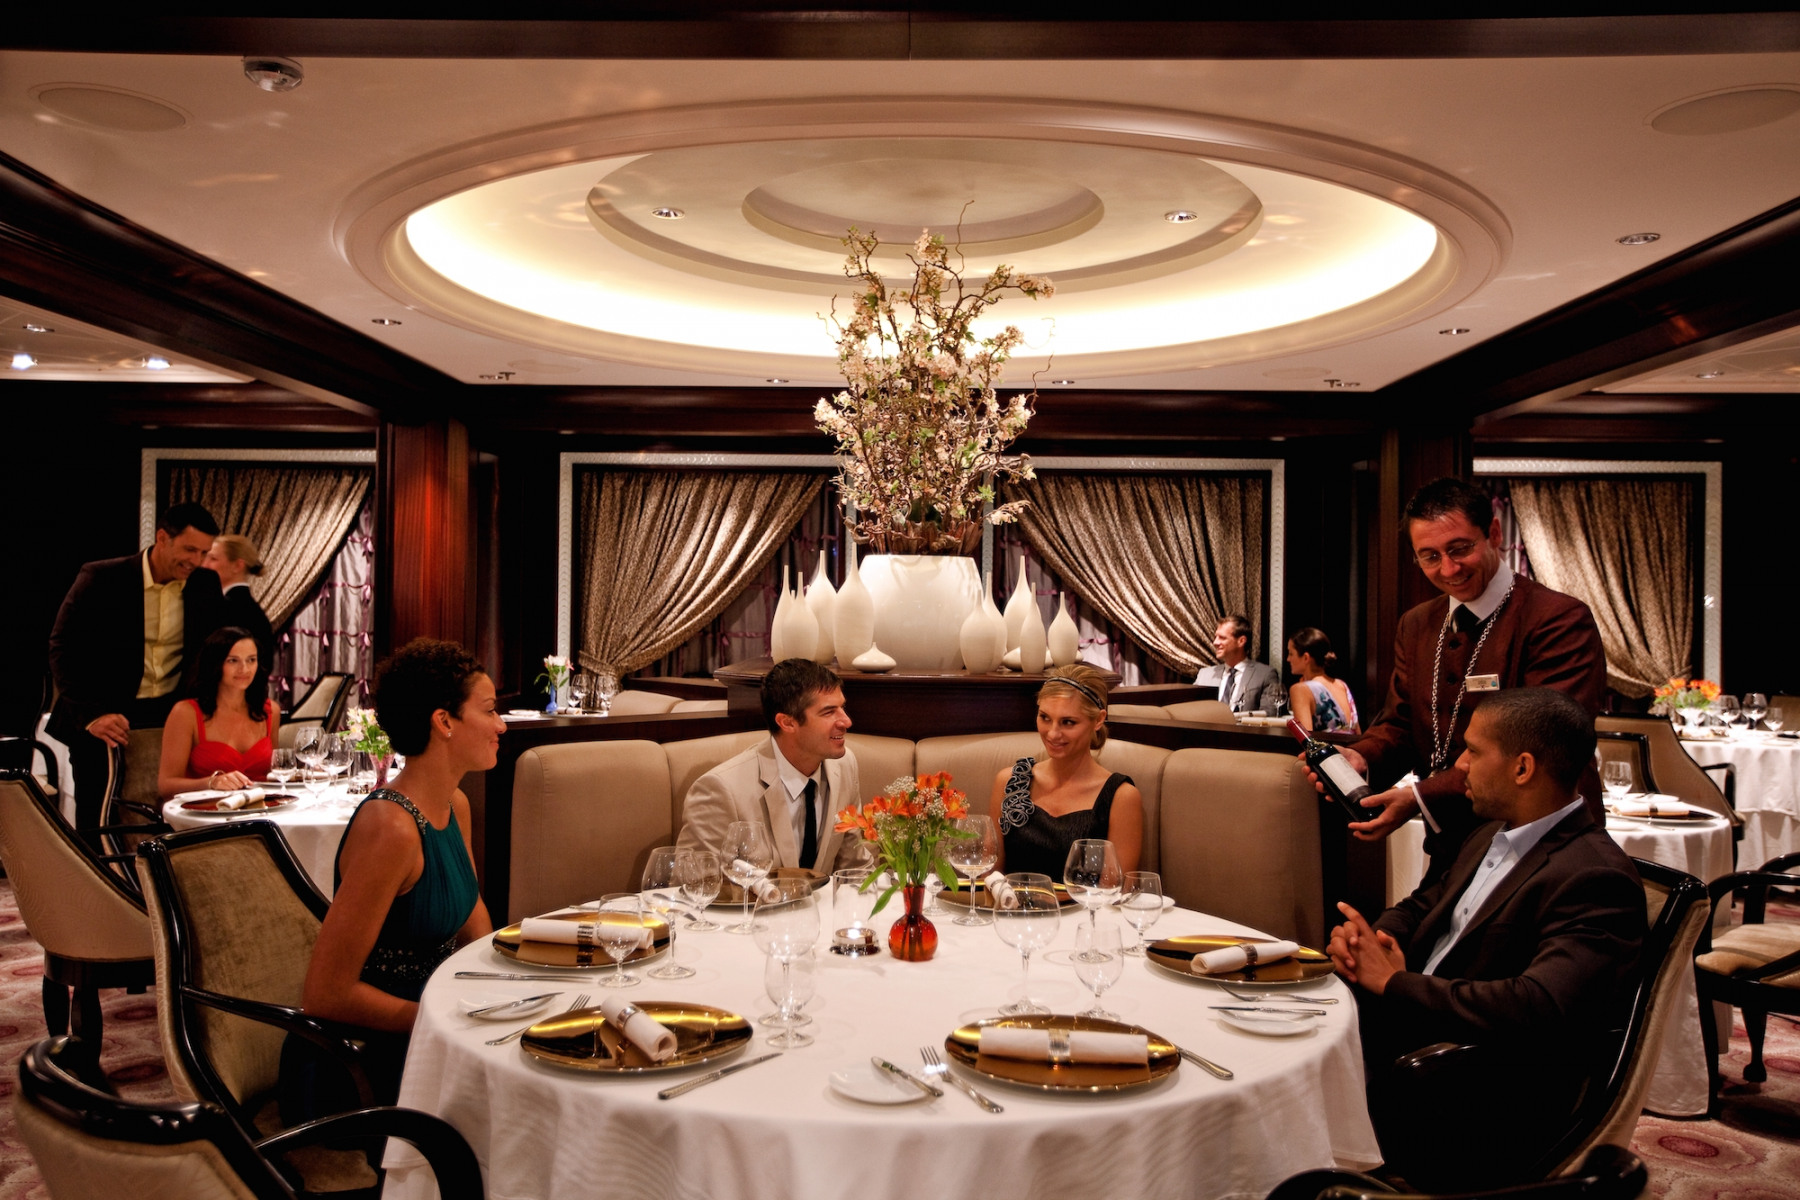 celebrity cruises celebrity solstice murano restaurant.jpg